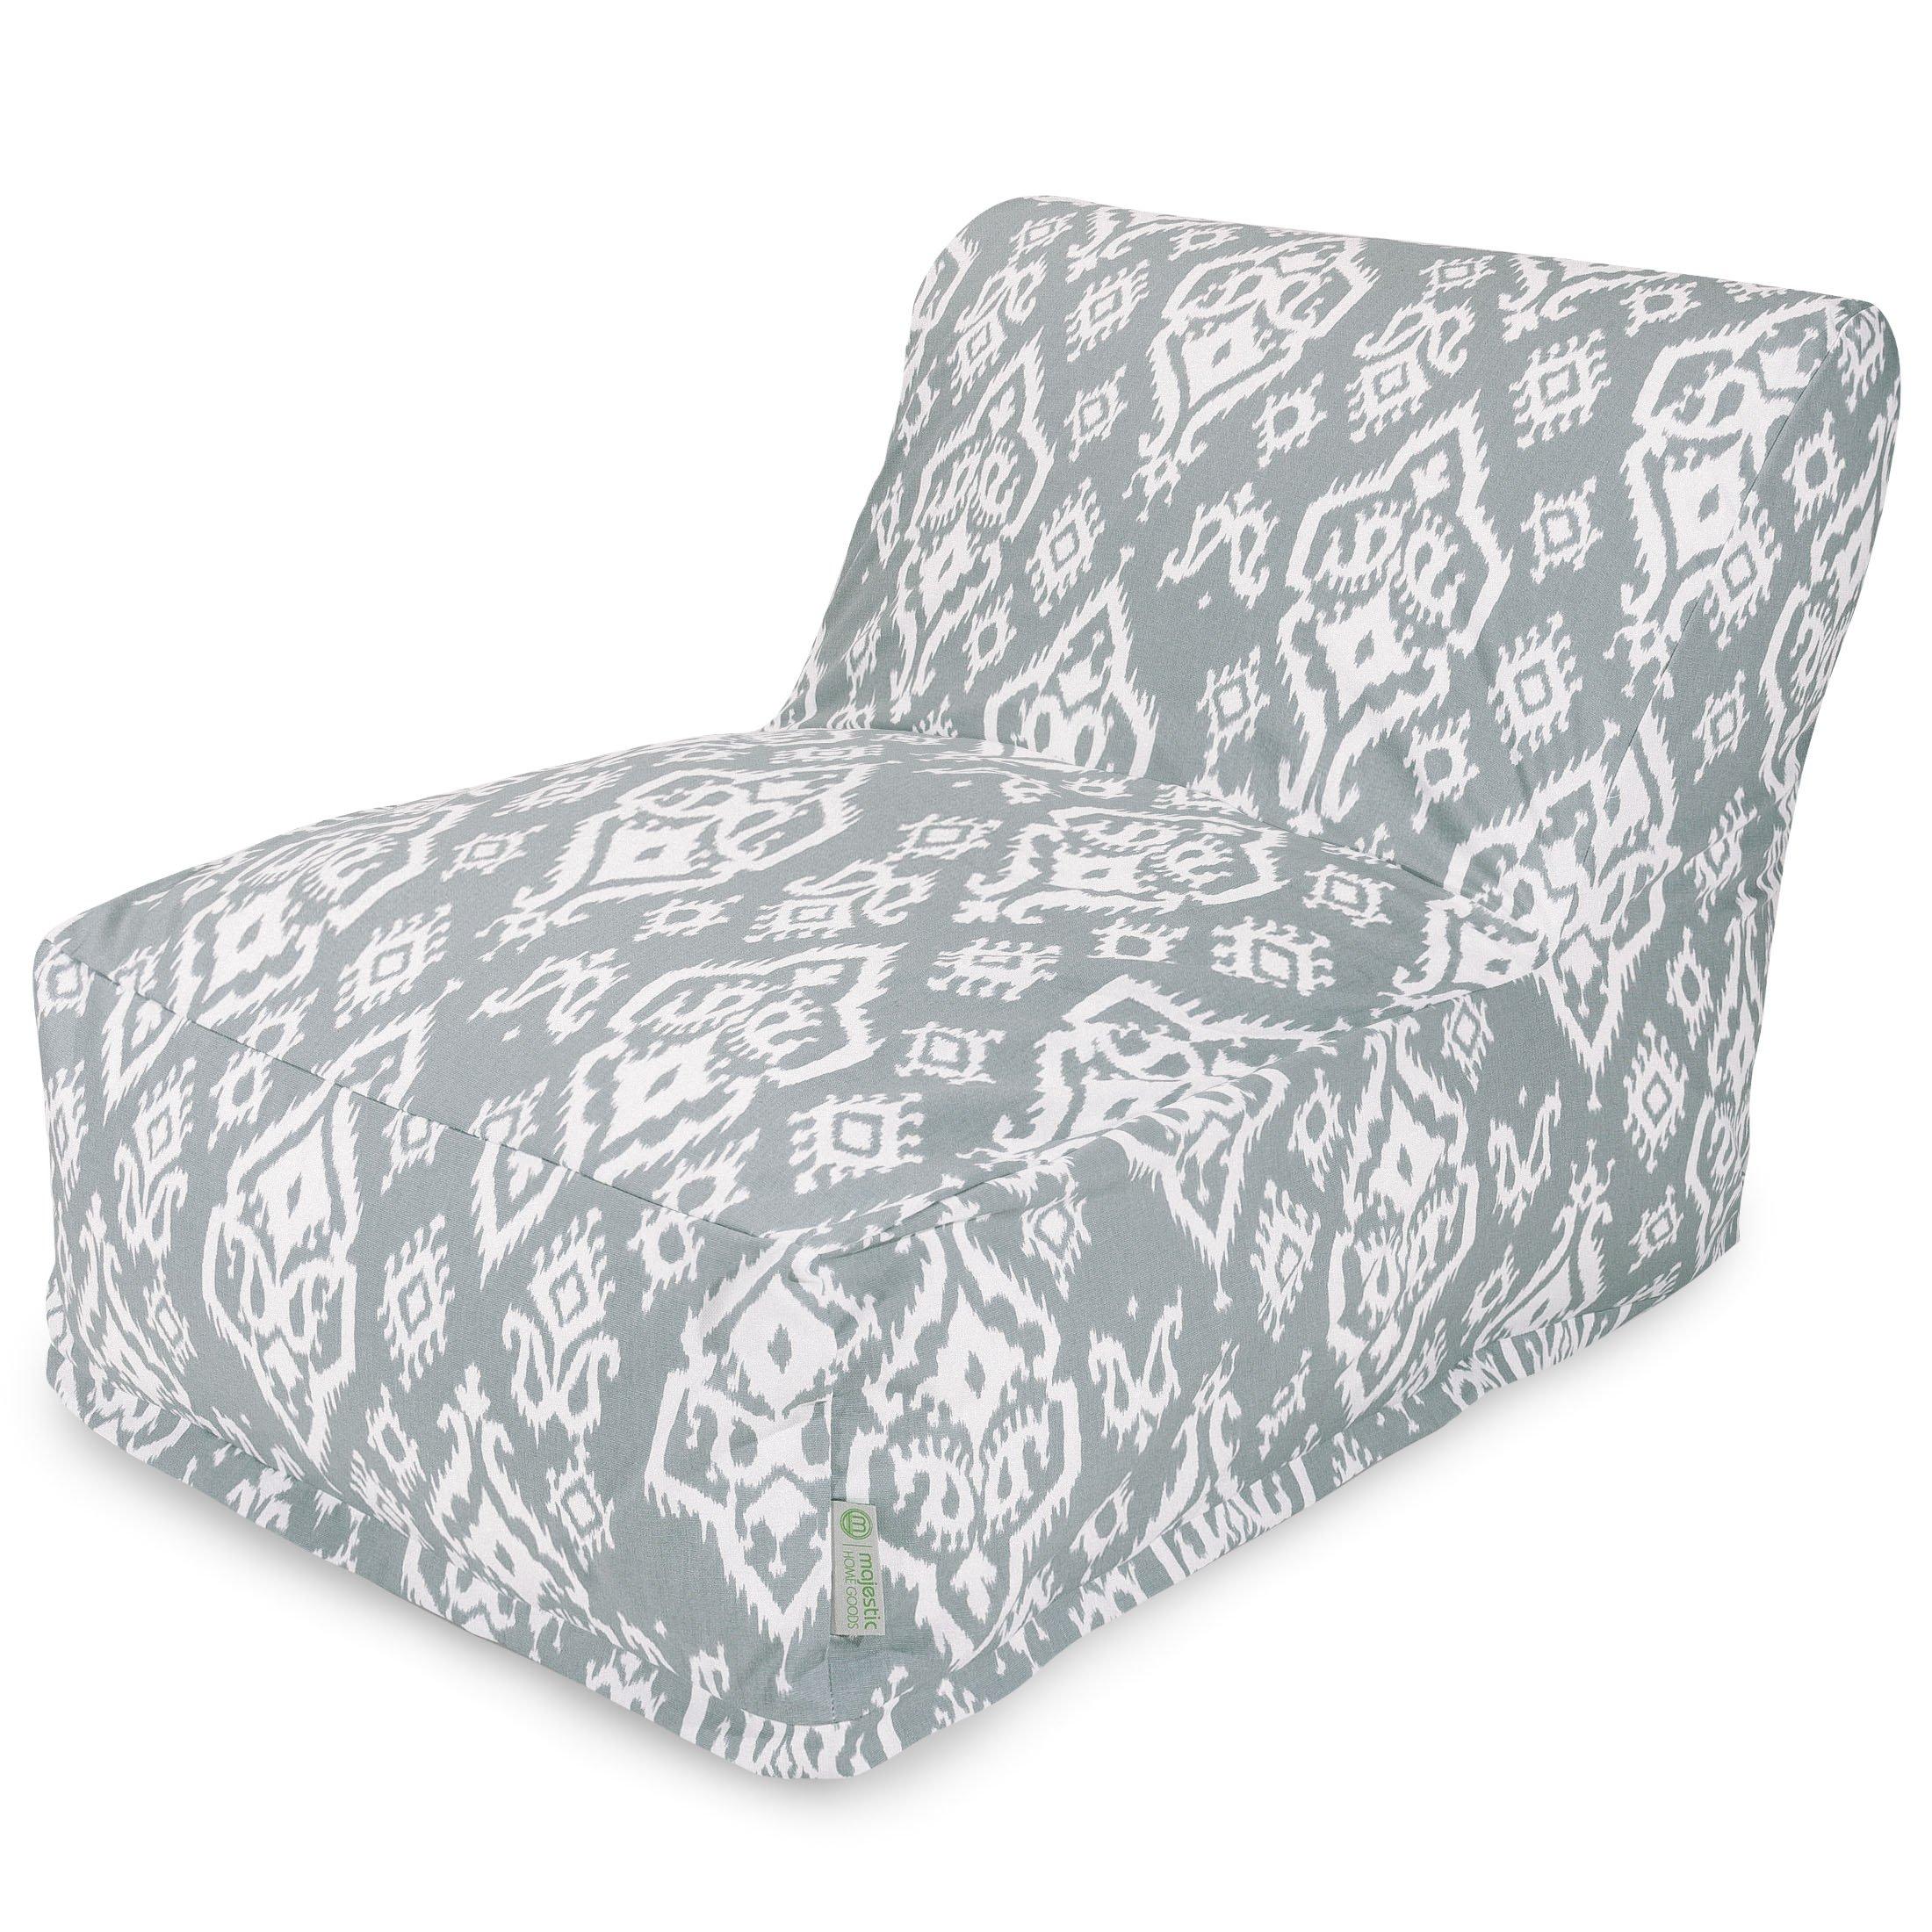 Majestic Home Goods Raja Bean Bag Chair Lounger, Gray